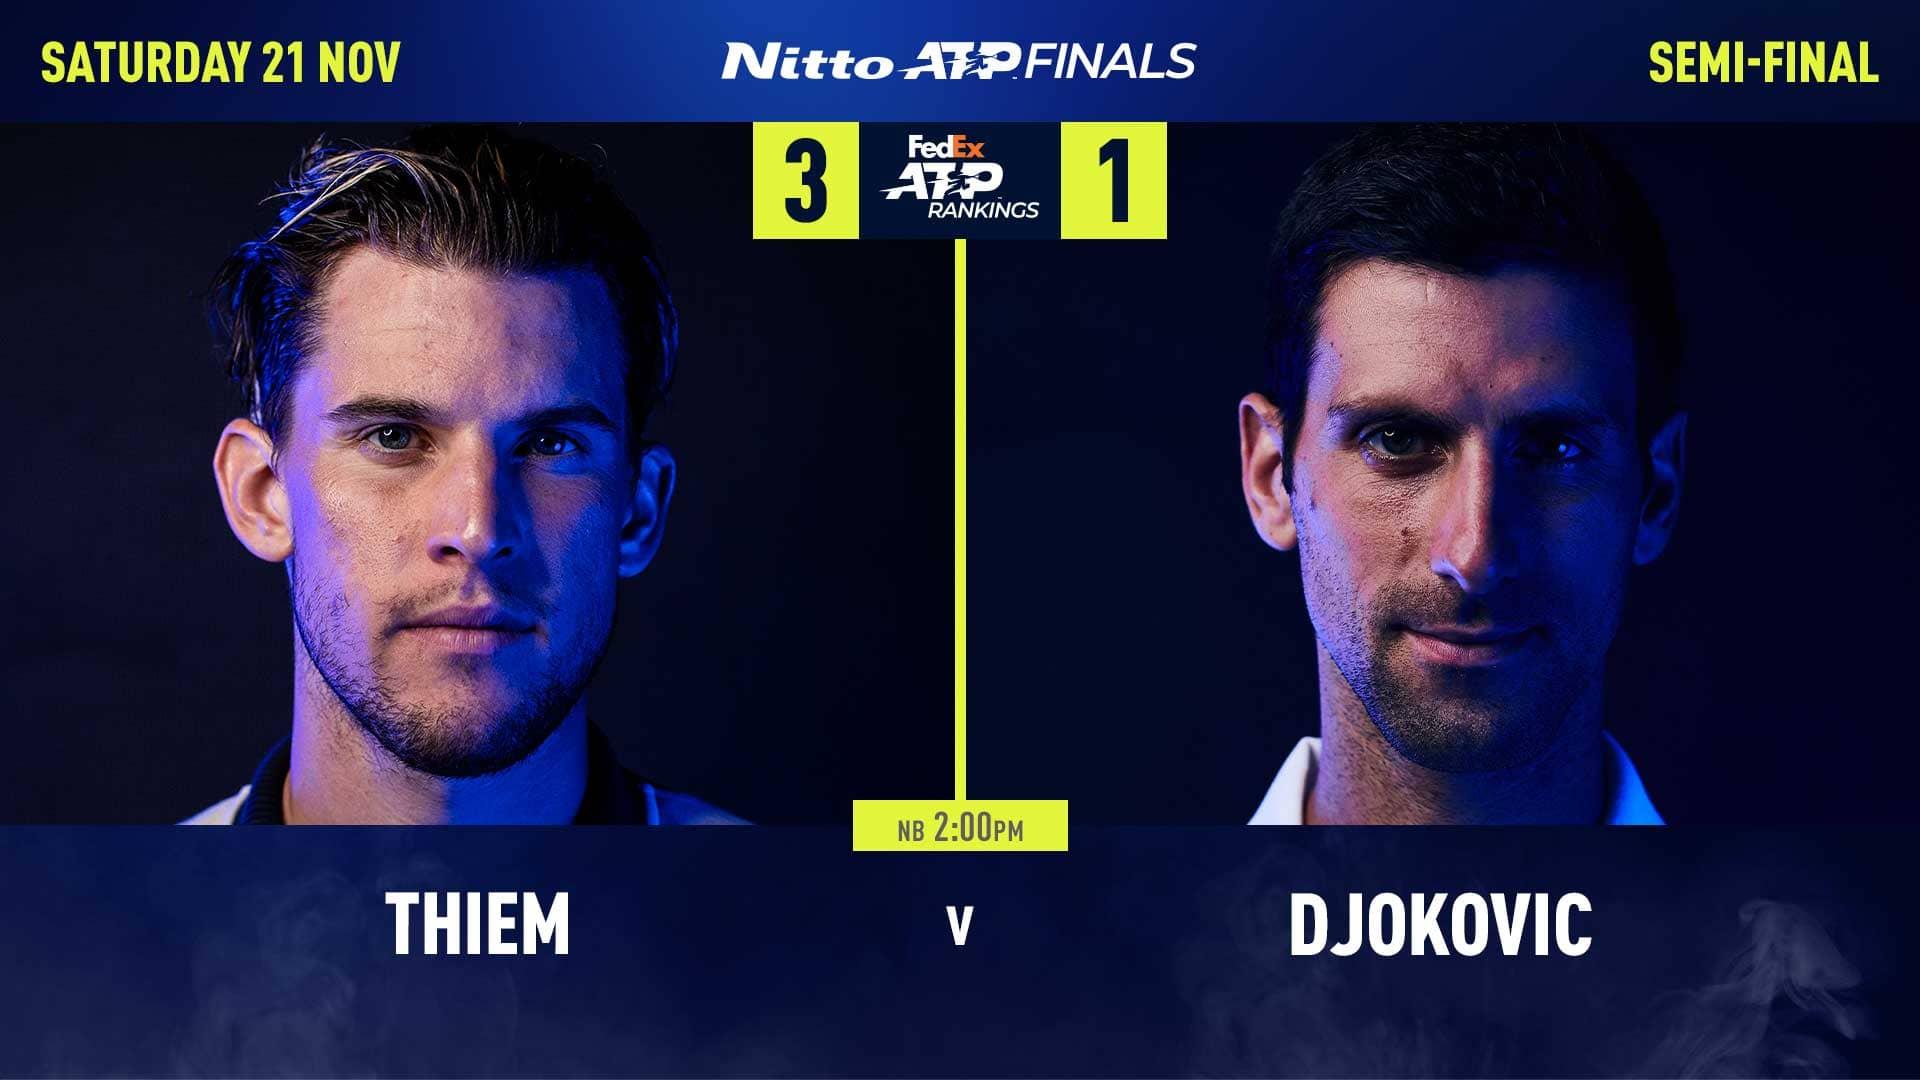 ATP年终总决赛半决赛德约对战蒂姆,今年有望复仇